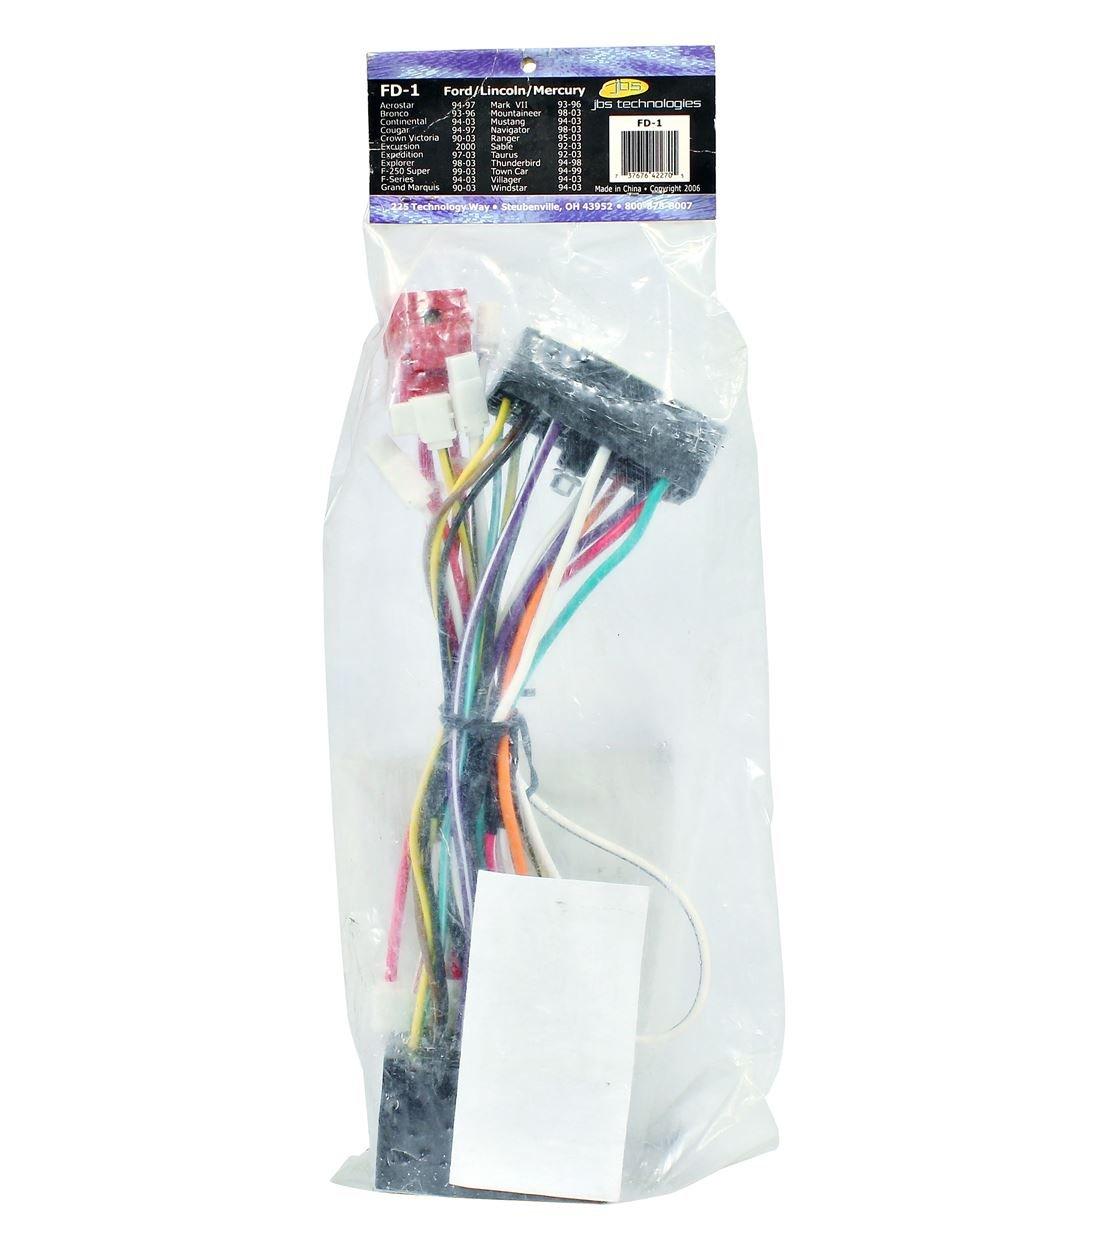 614CGOc oUL._SL1250_ amazon com bulldog fd 1 ford lincoln mercury car alarm remote fd 1 t-harness remote starter wiring at virtualis.co